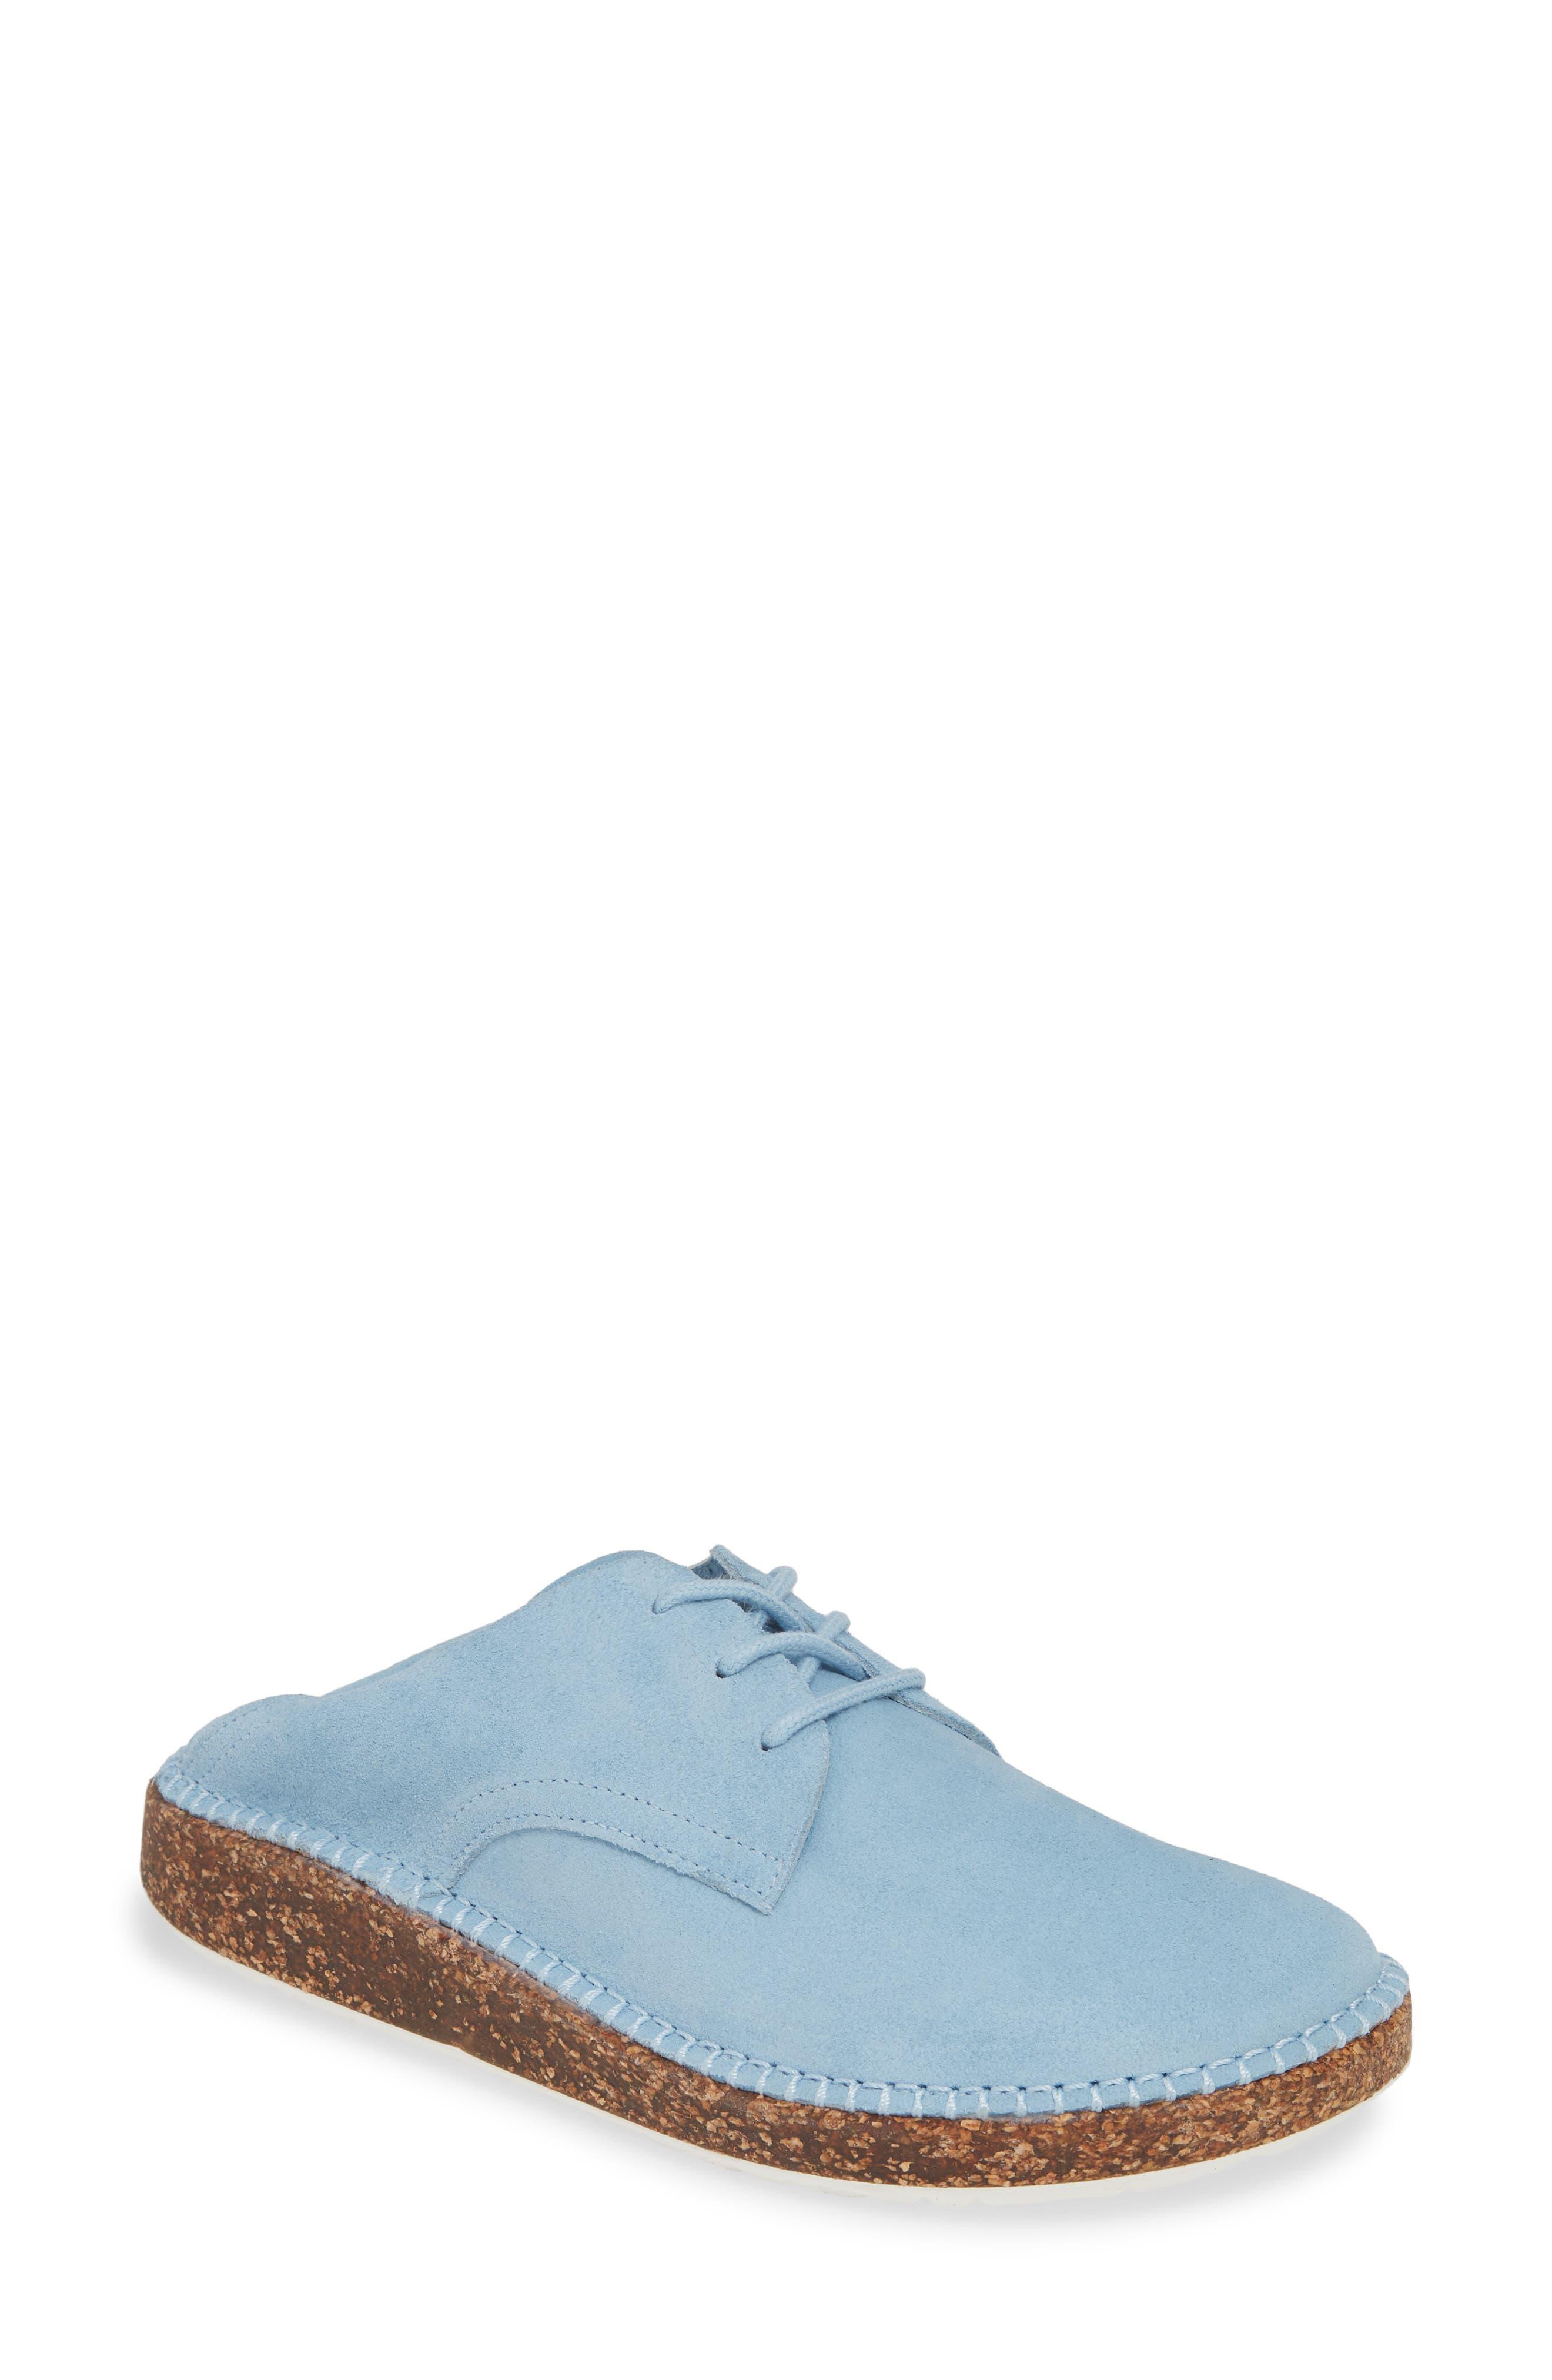 Birkenstock Gary Convertible Derby,8.5 B - Blue